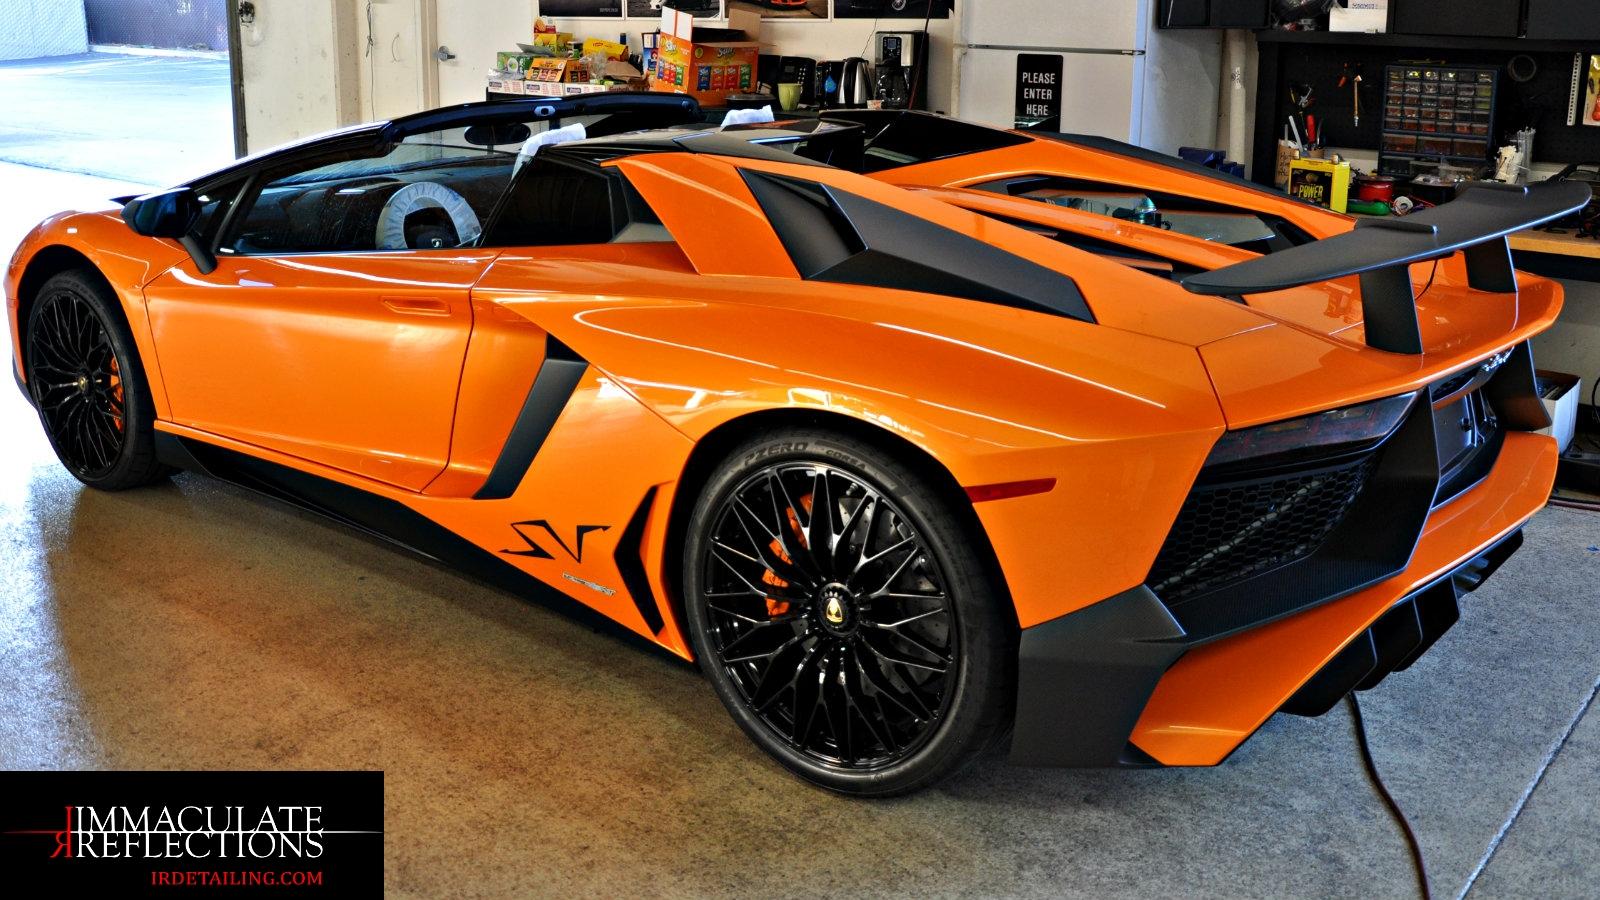 The Ceramic Nano Coating really makes the paint pop on this Lamborghini Aventador Super Veloce.